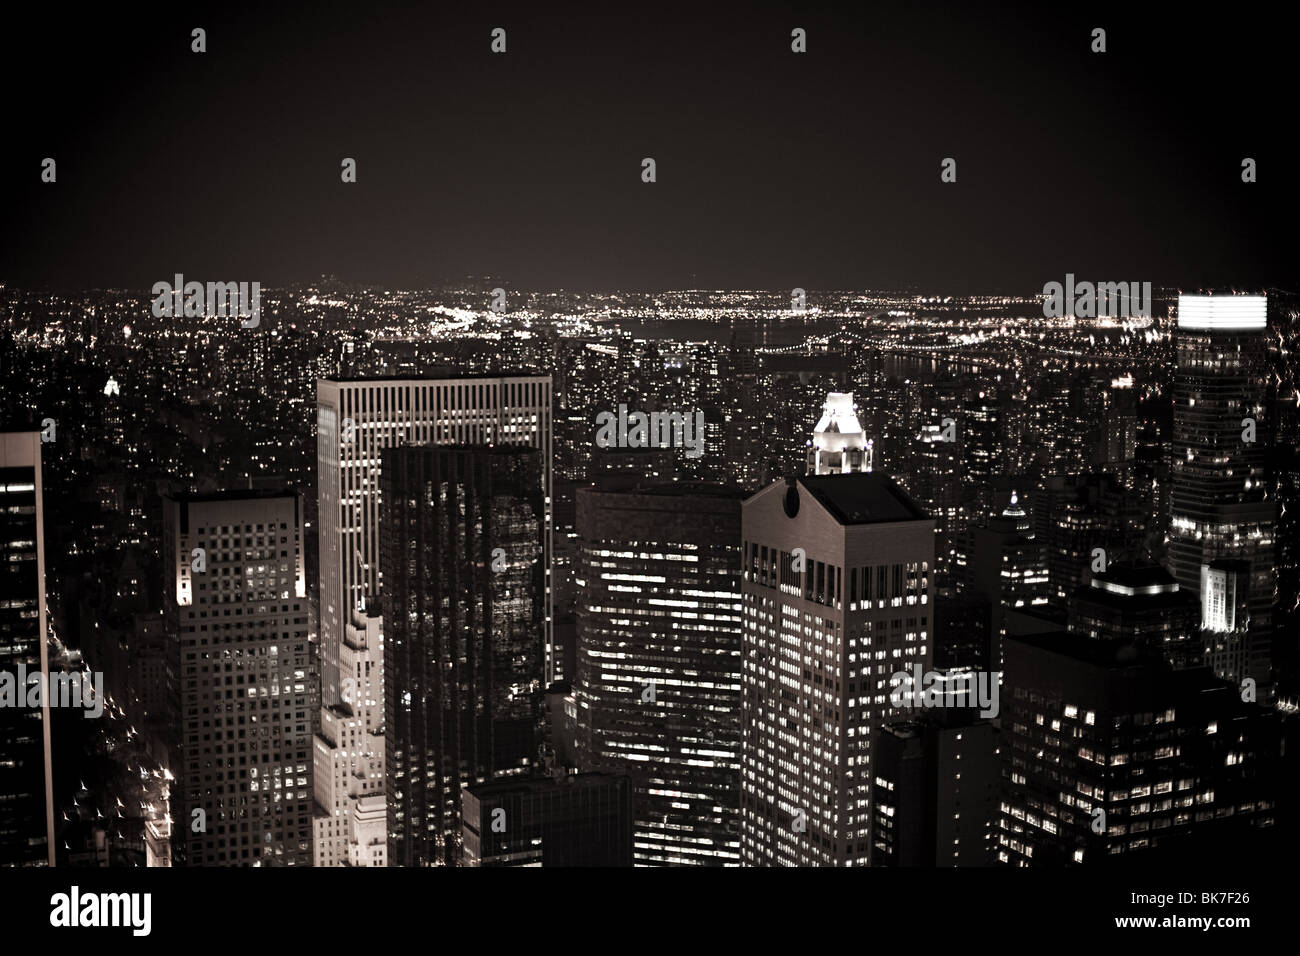 Midtown manhattan at night - Stock Image